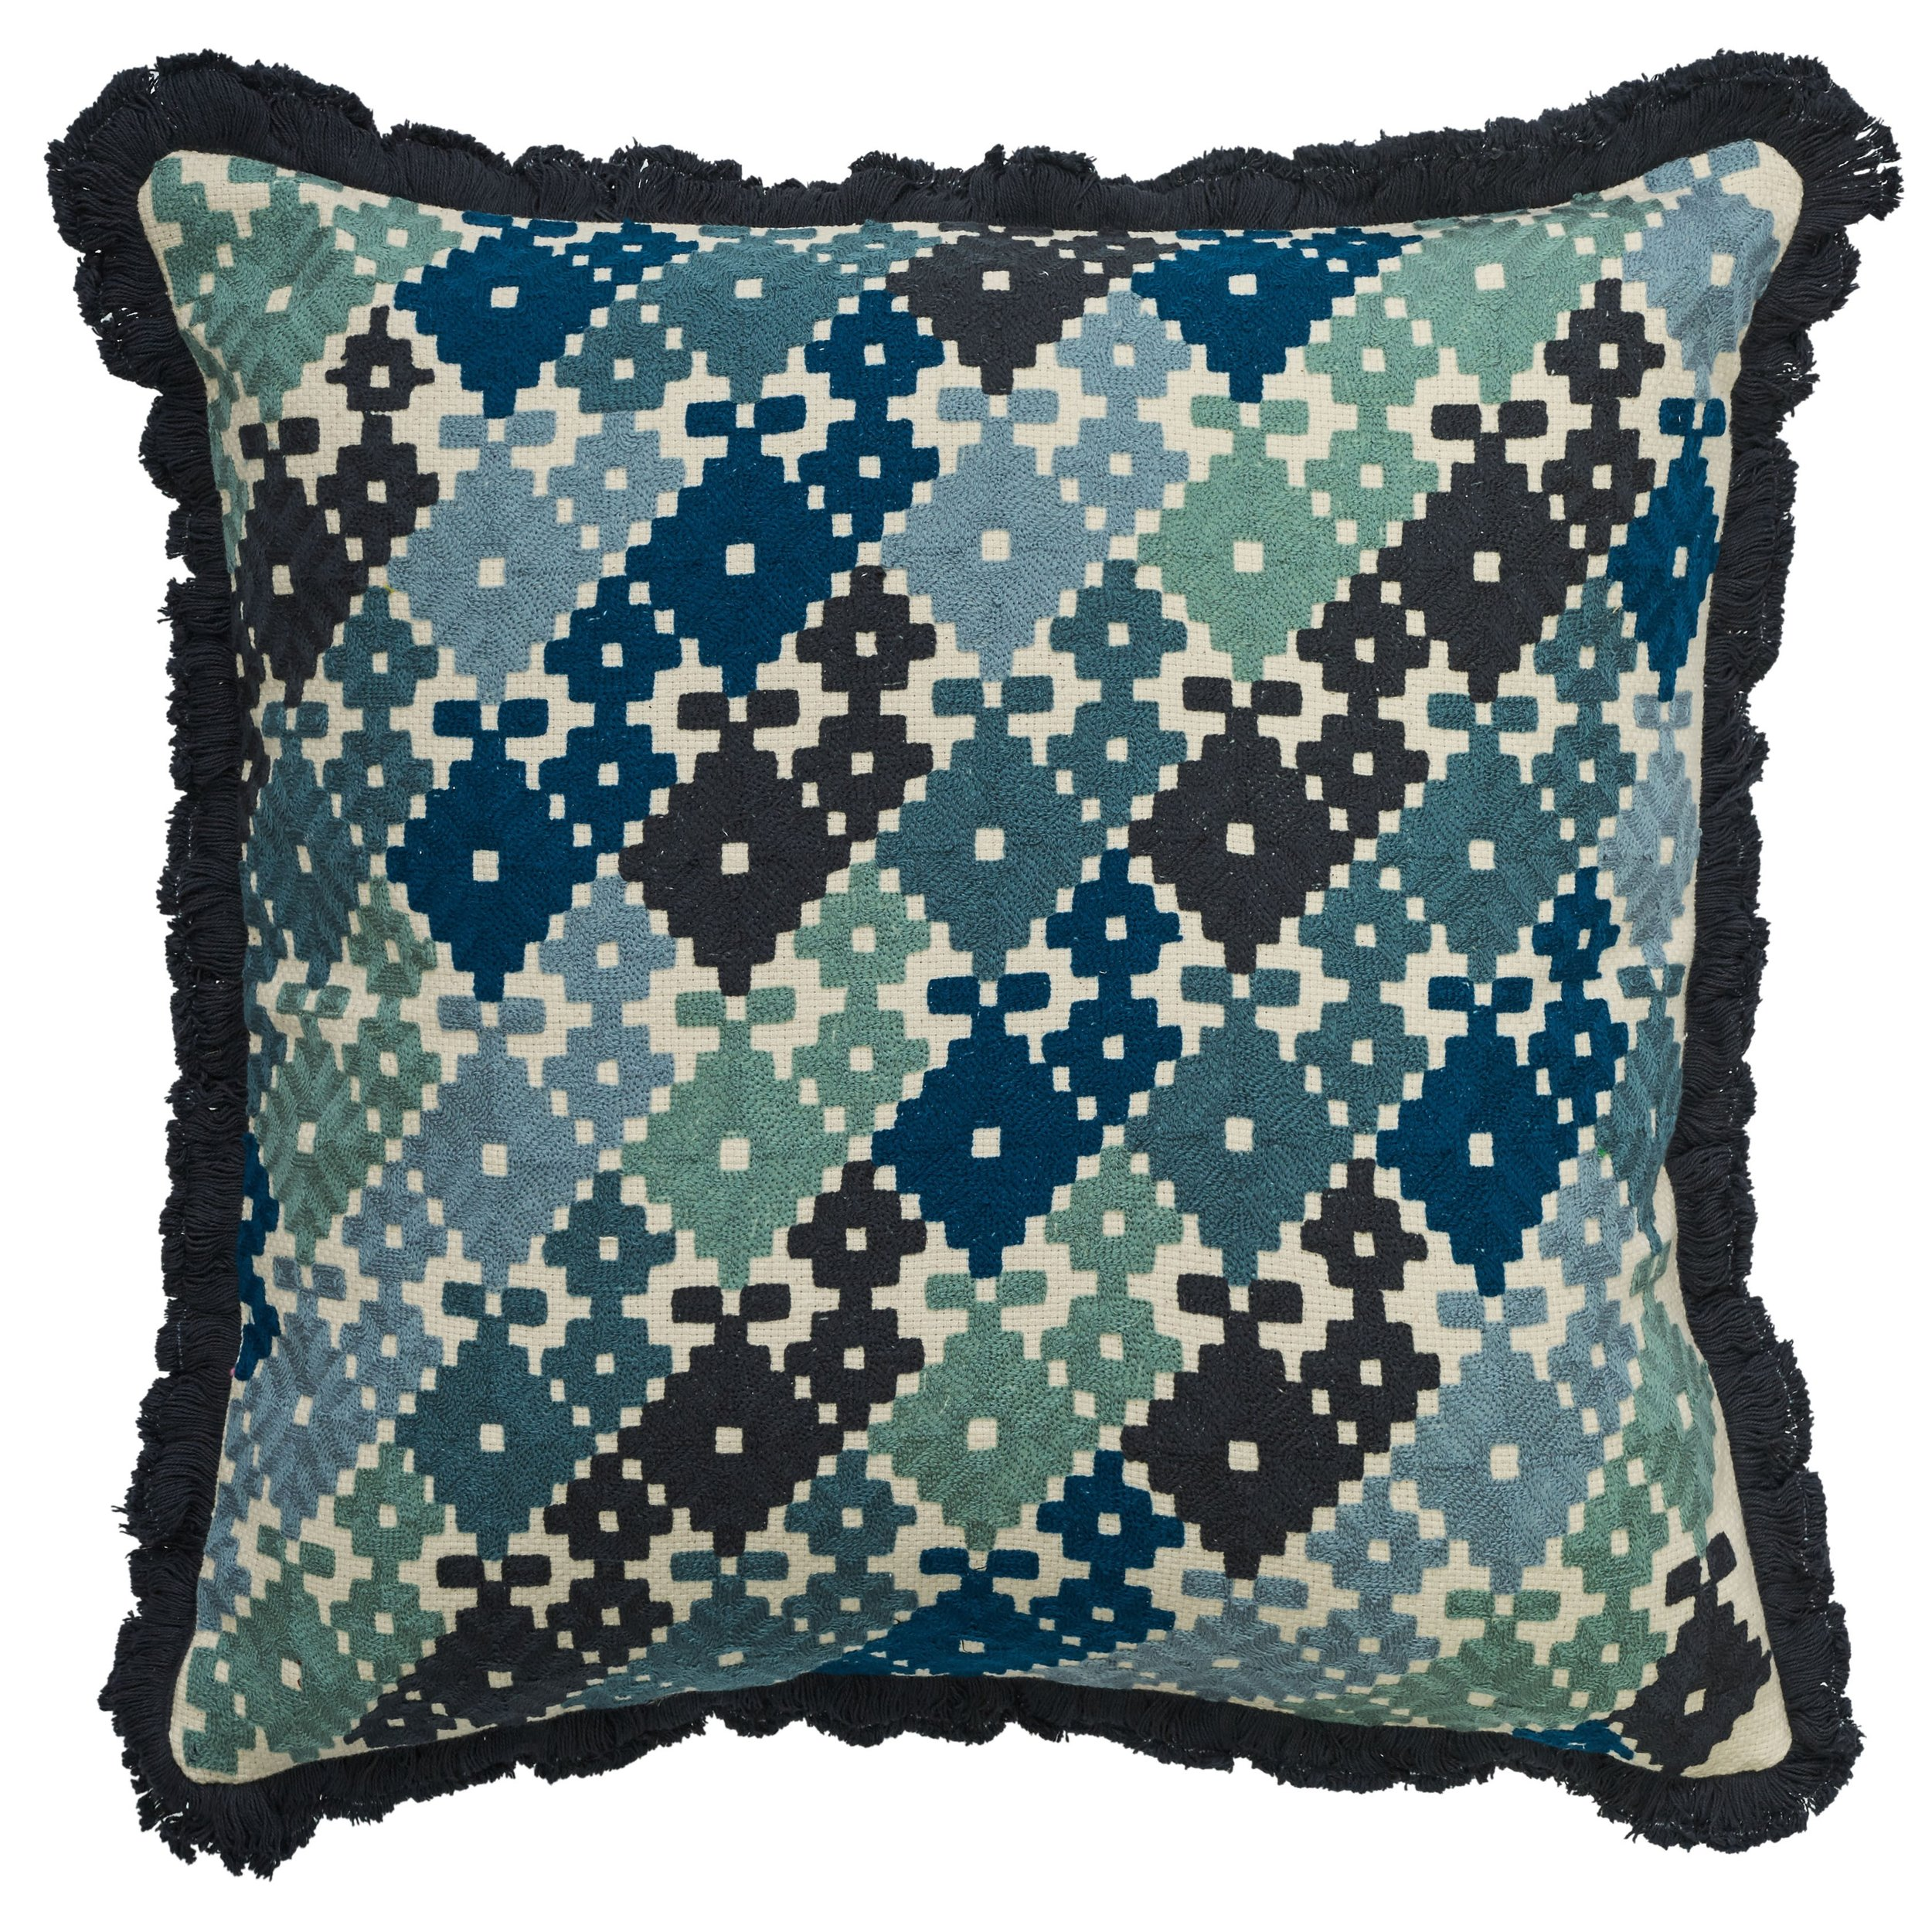 catalina adler cushion -